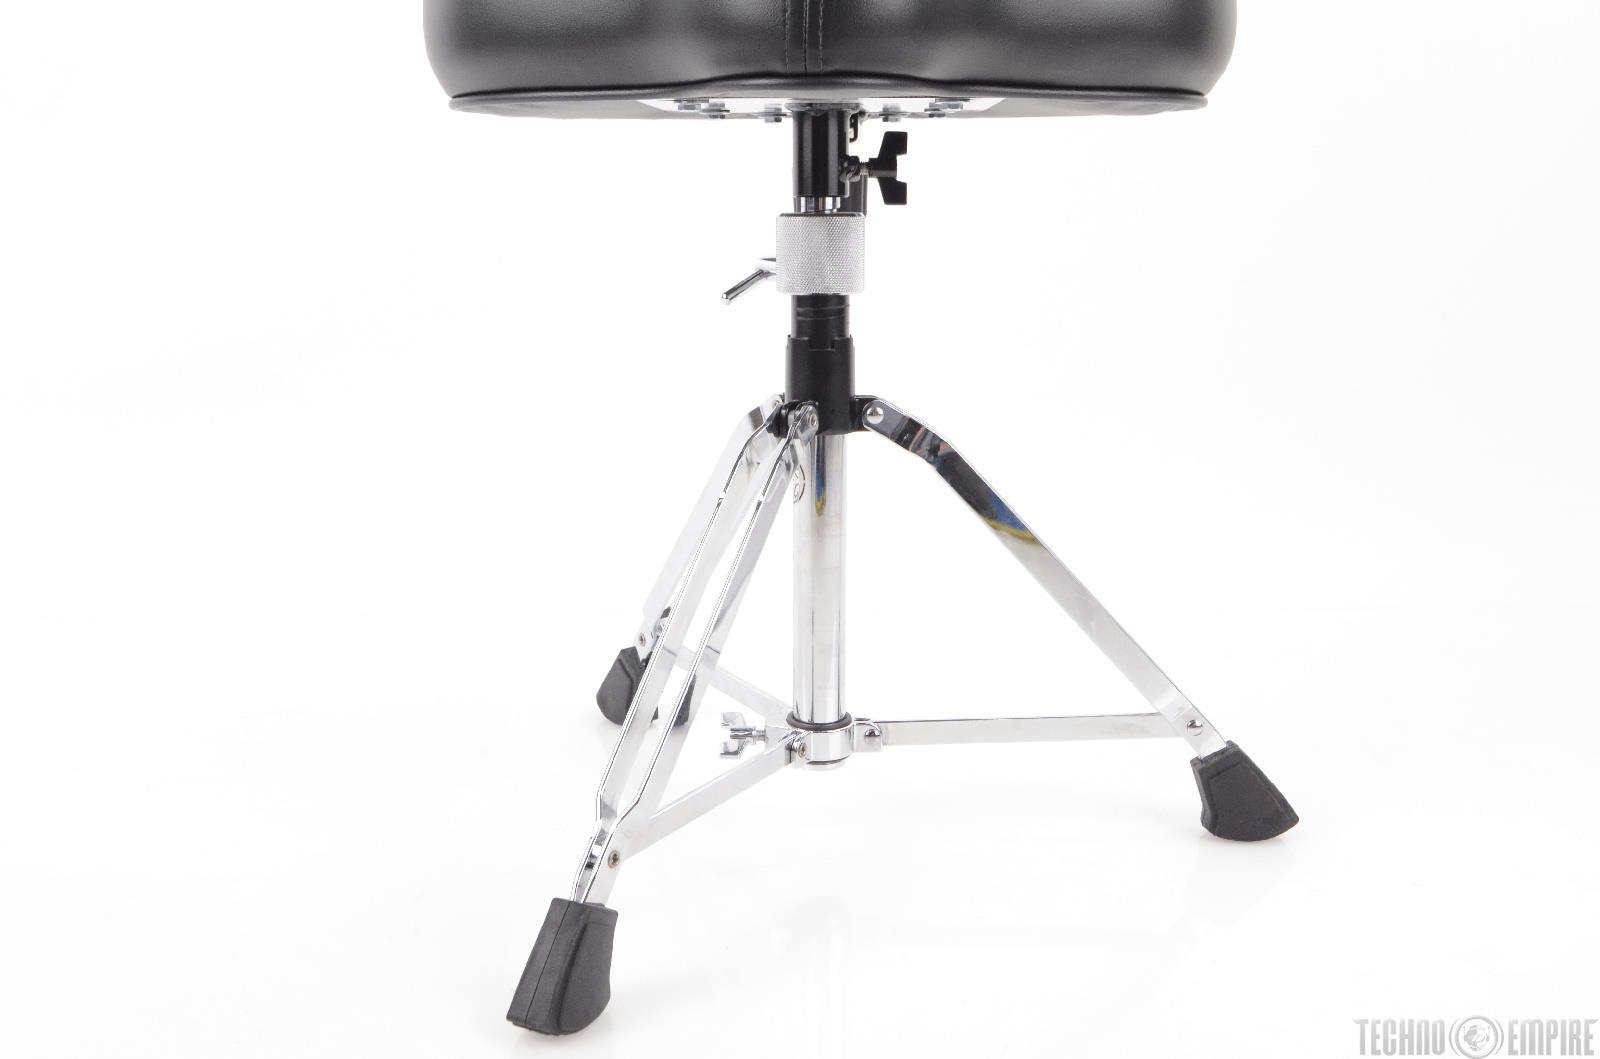 roc n soc mss o w b manual spindle short original seat back drum throne 21719 ebay. Black Bedroom Furniture Sets. Home Design Ideas